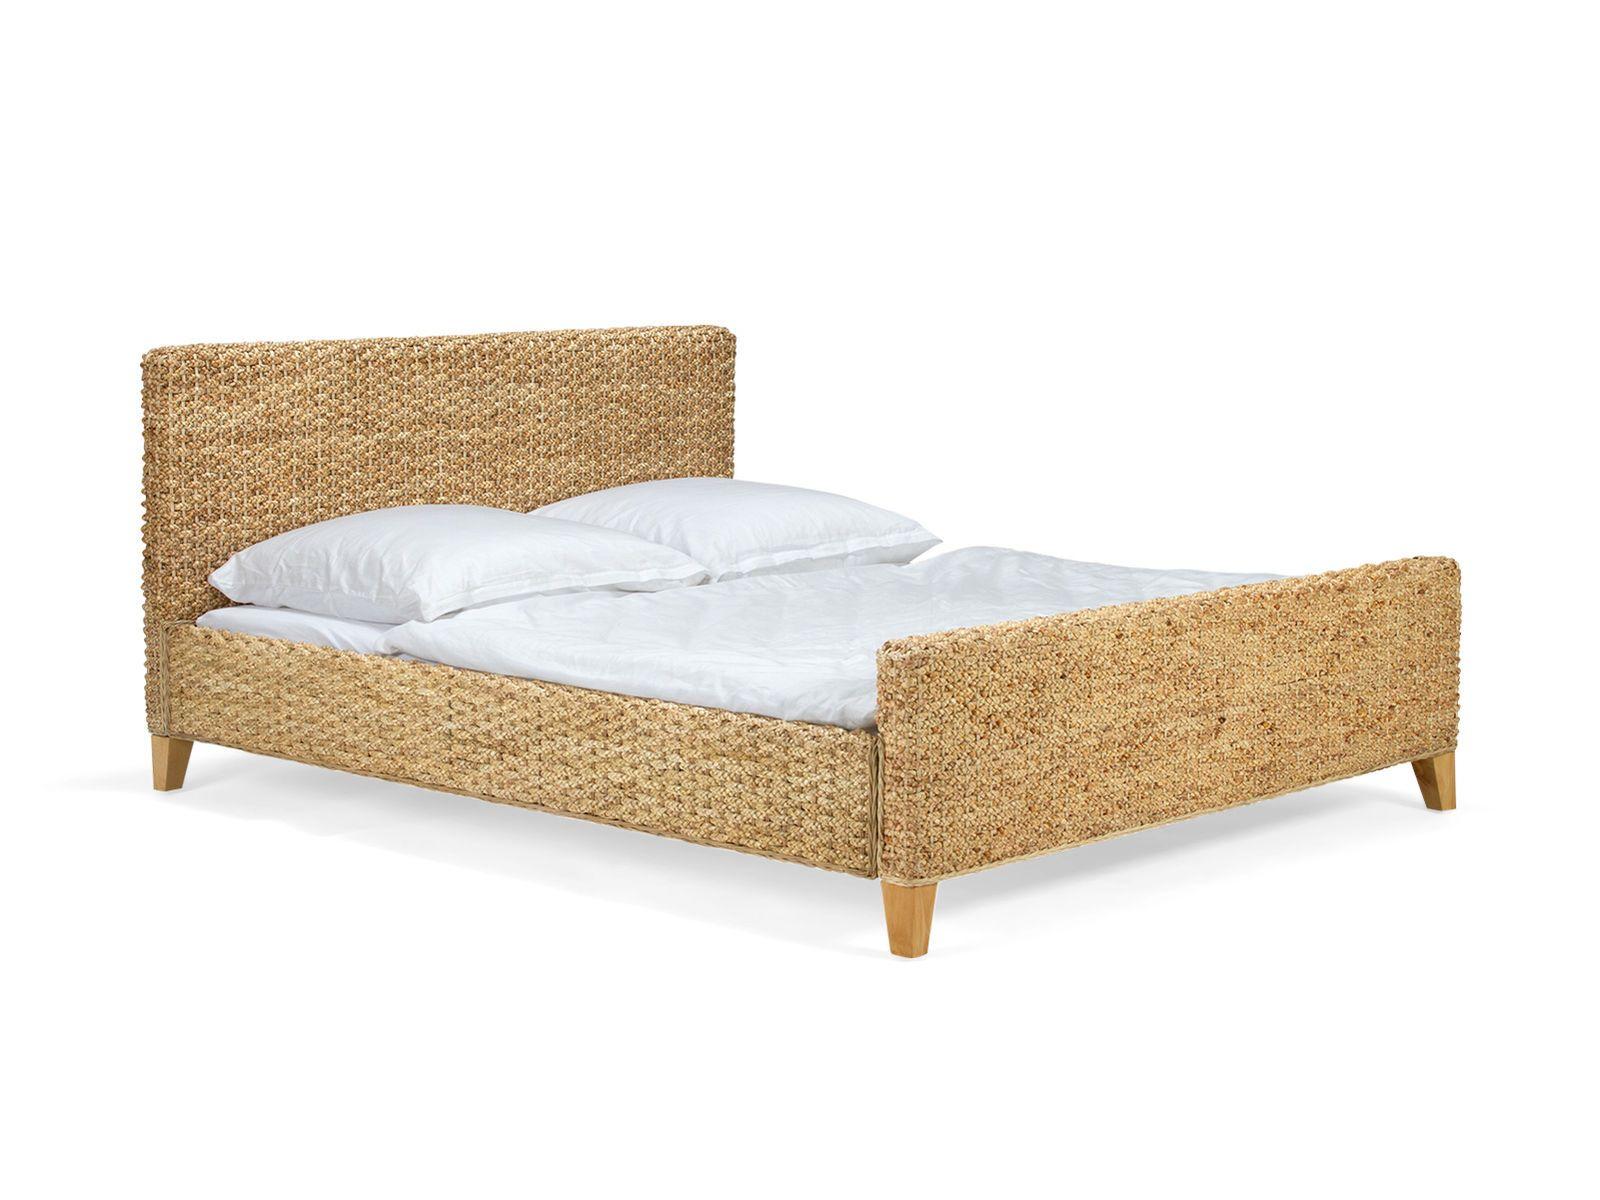 Korbbett Nizza versandkostenfreie Möbel